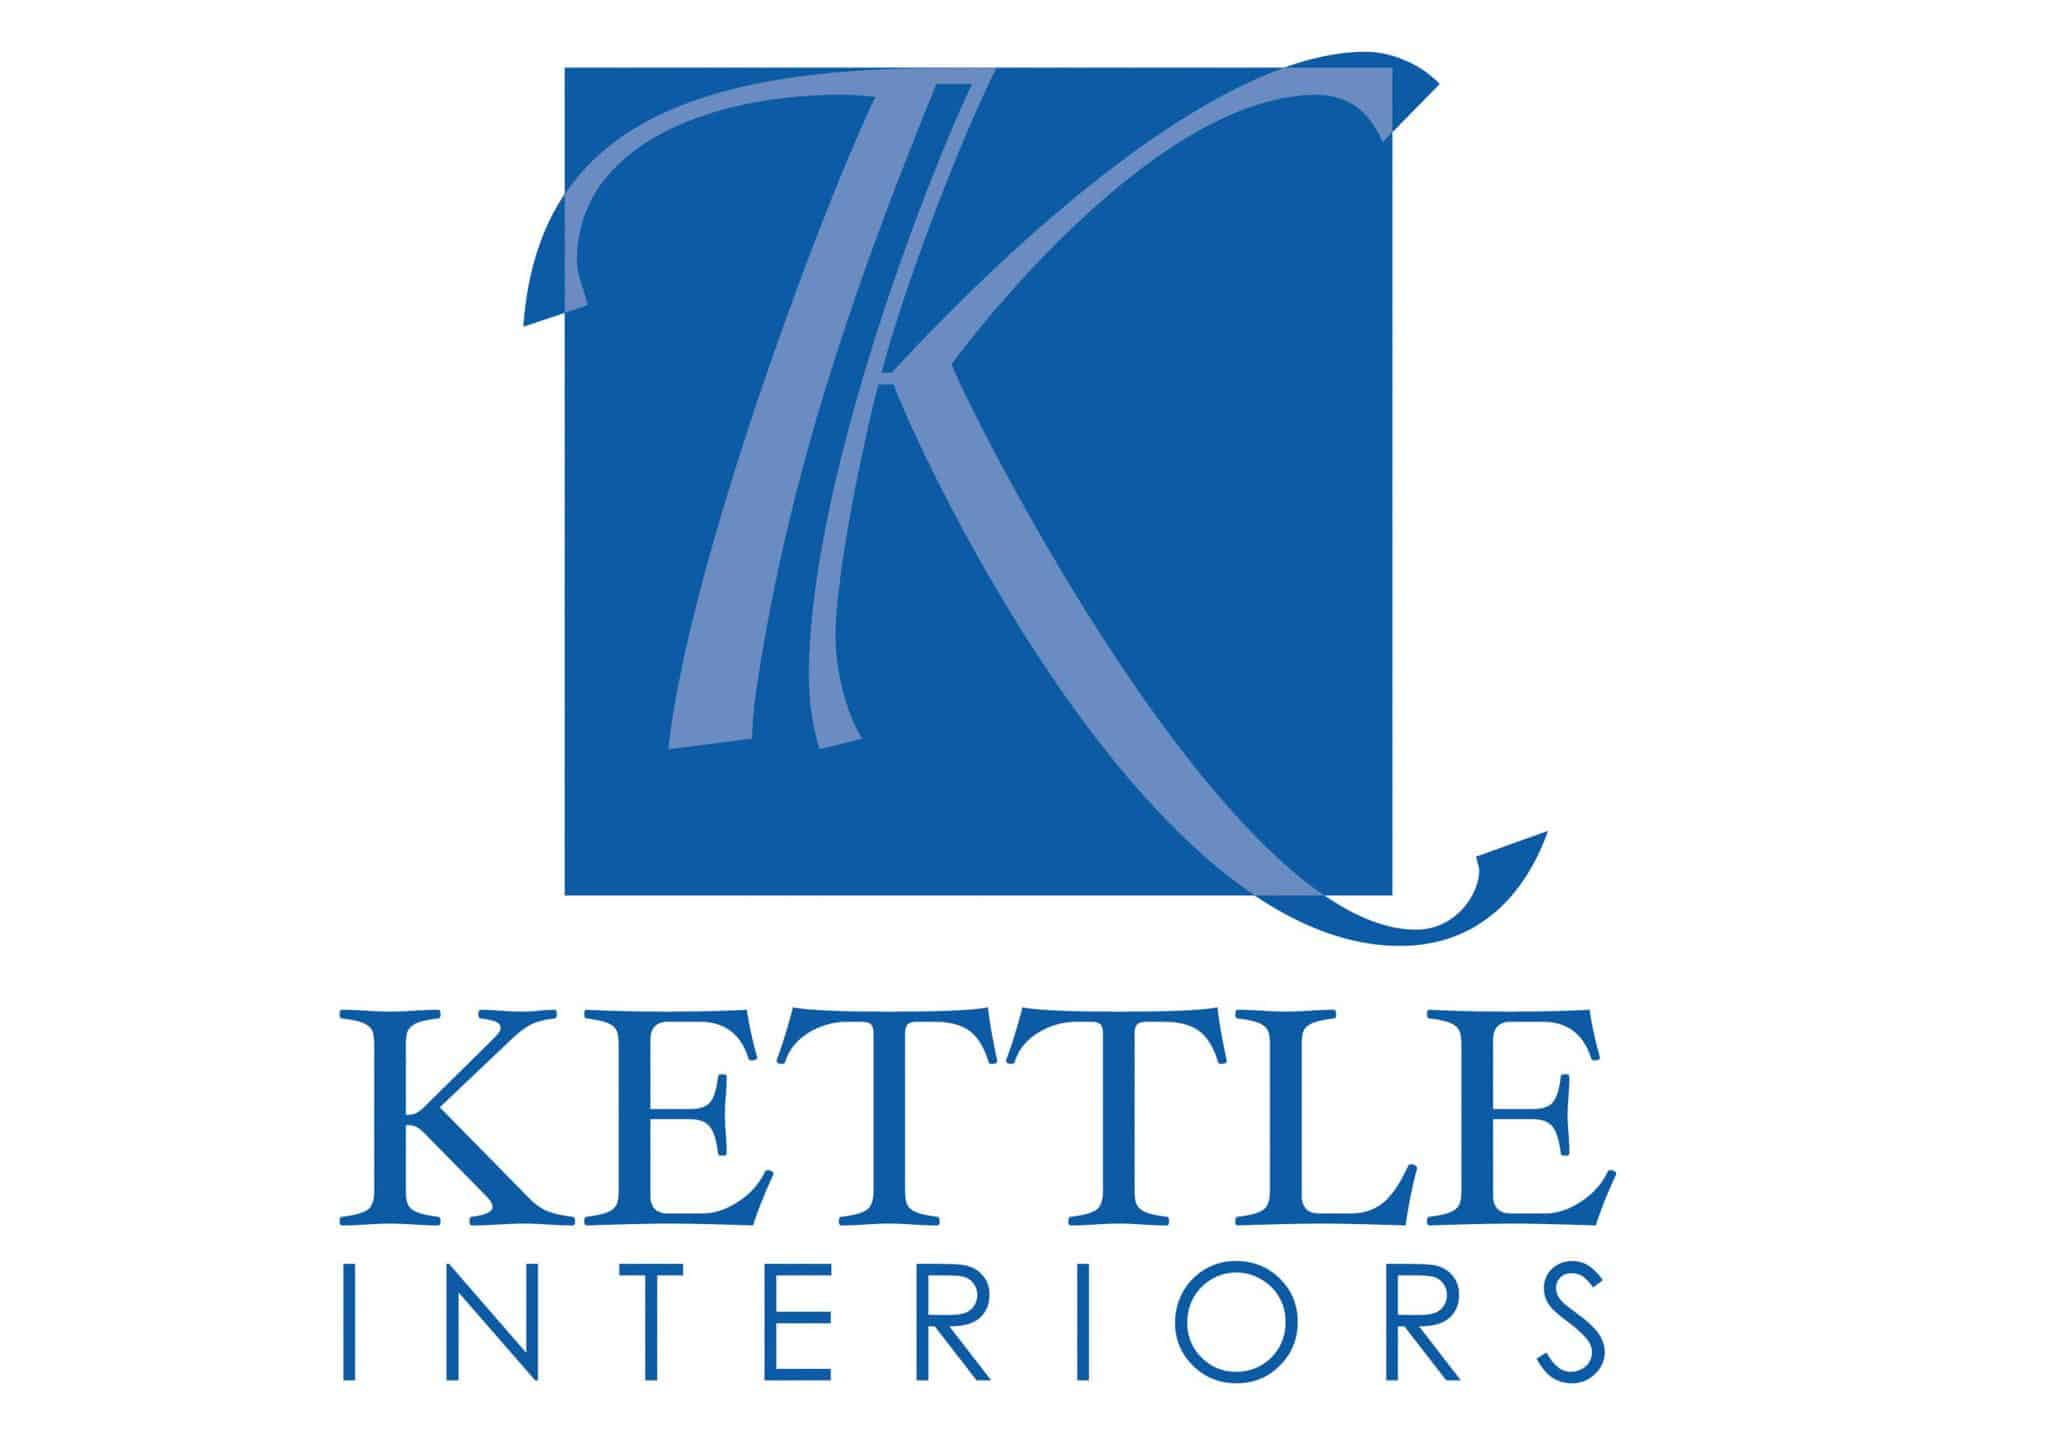 kettle interiors logo 1 scaled